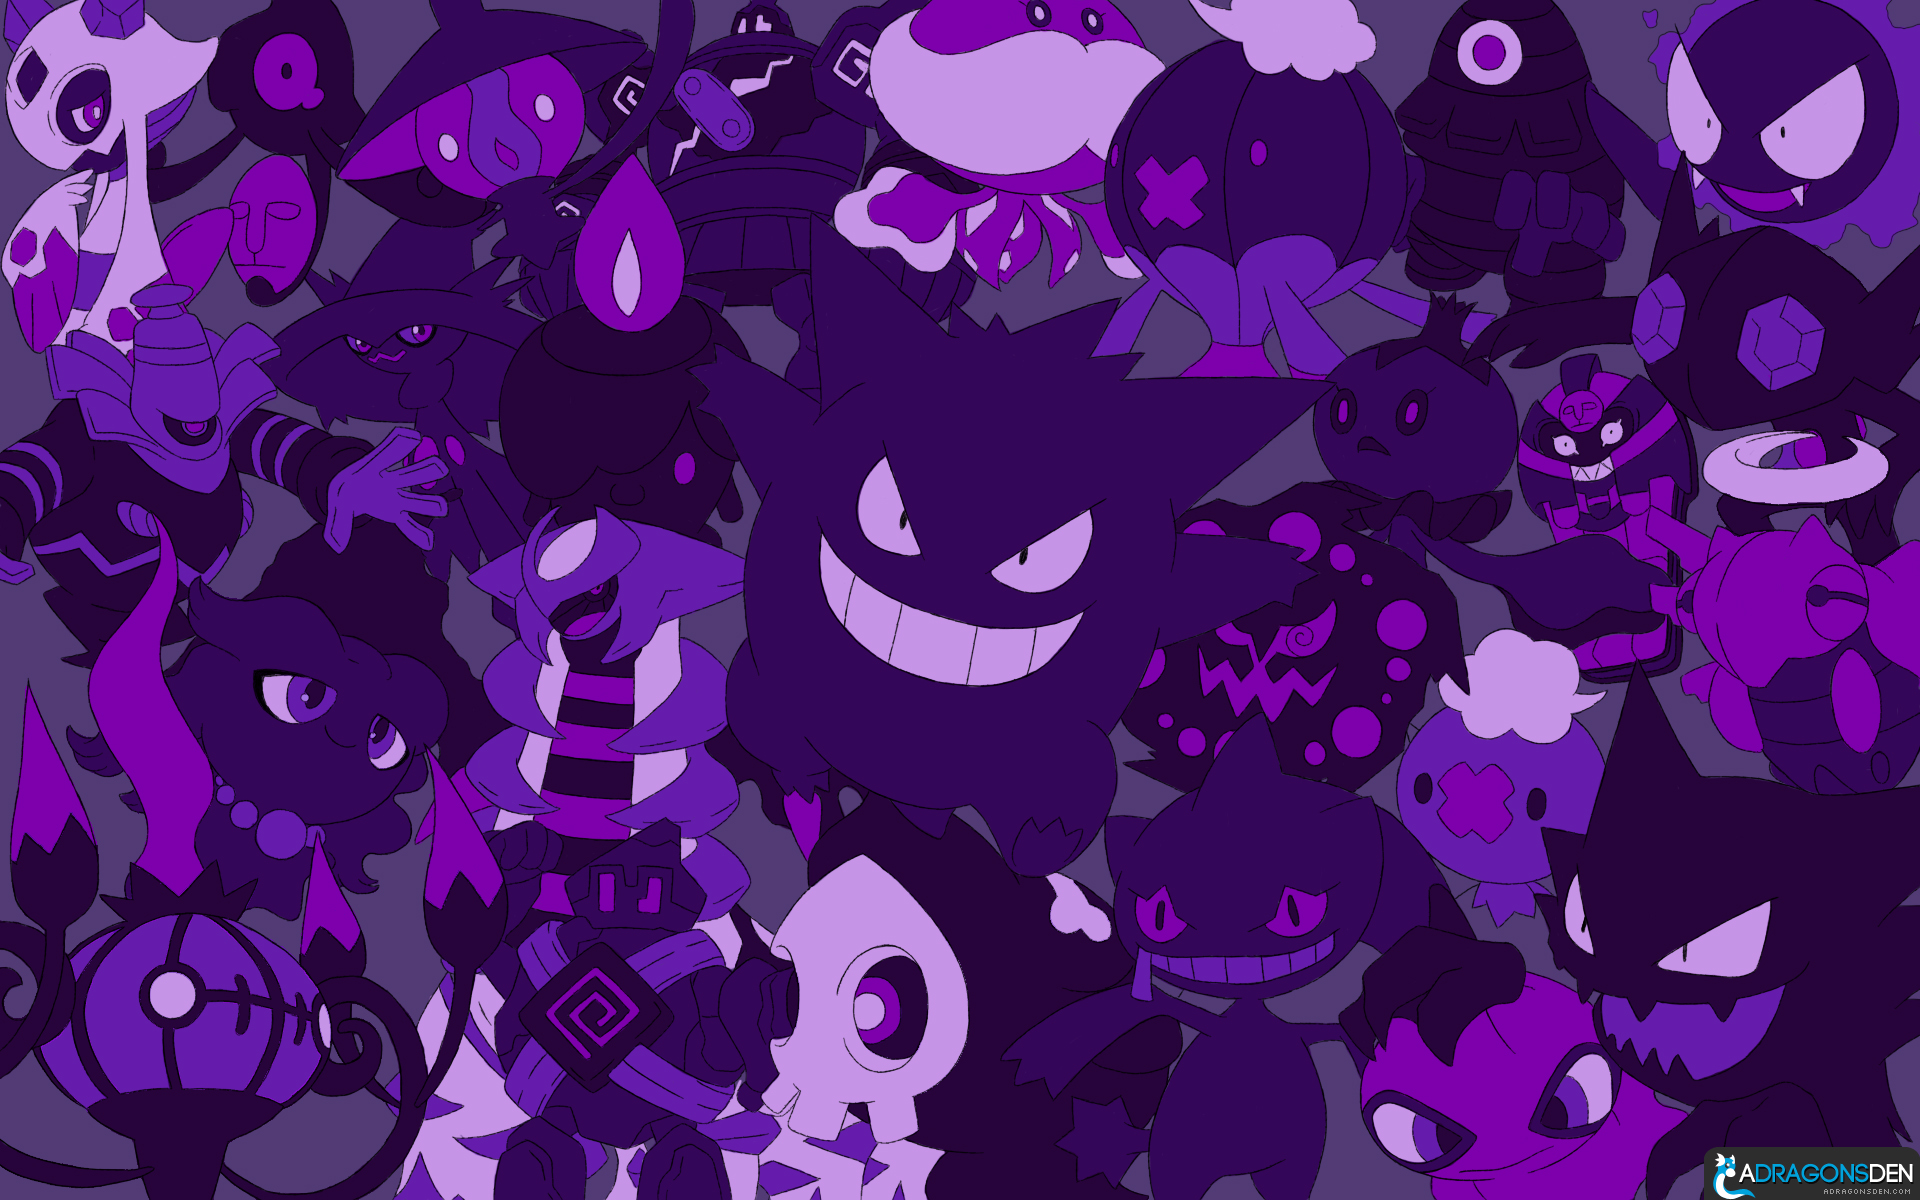 Pokémon Hd Wallpaper Background Image 1920x1200 Id